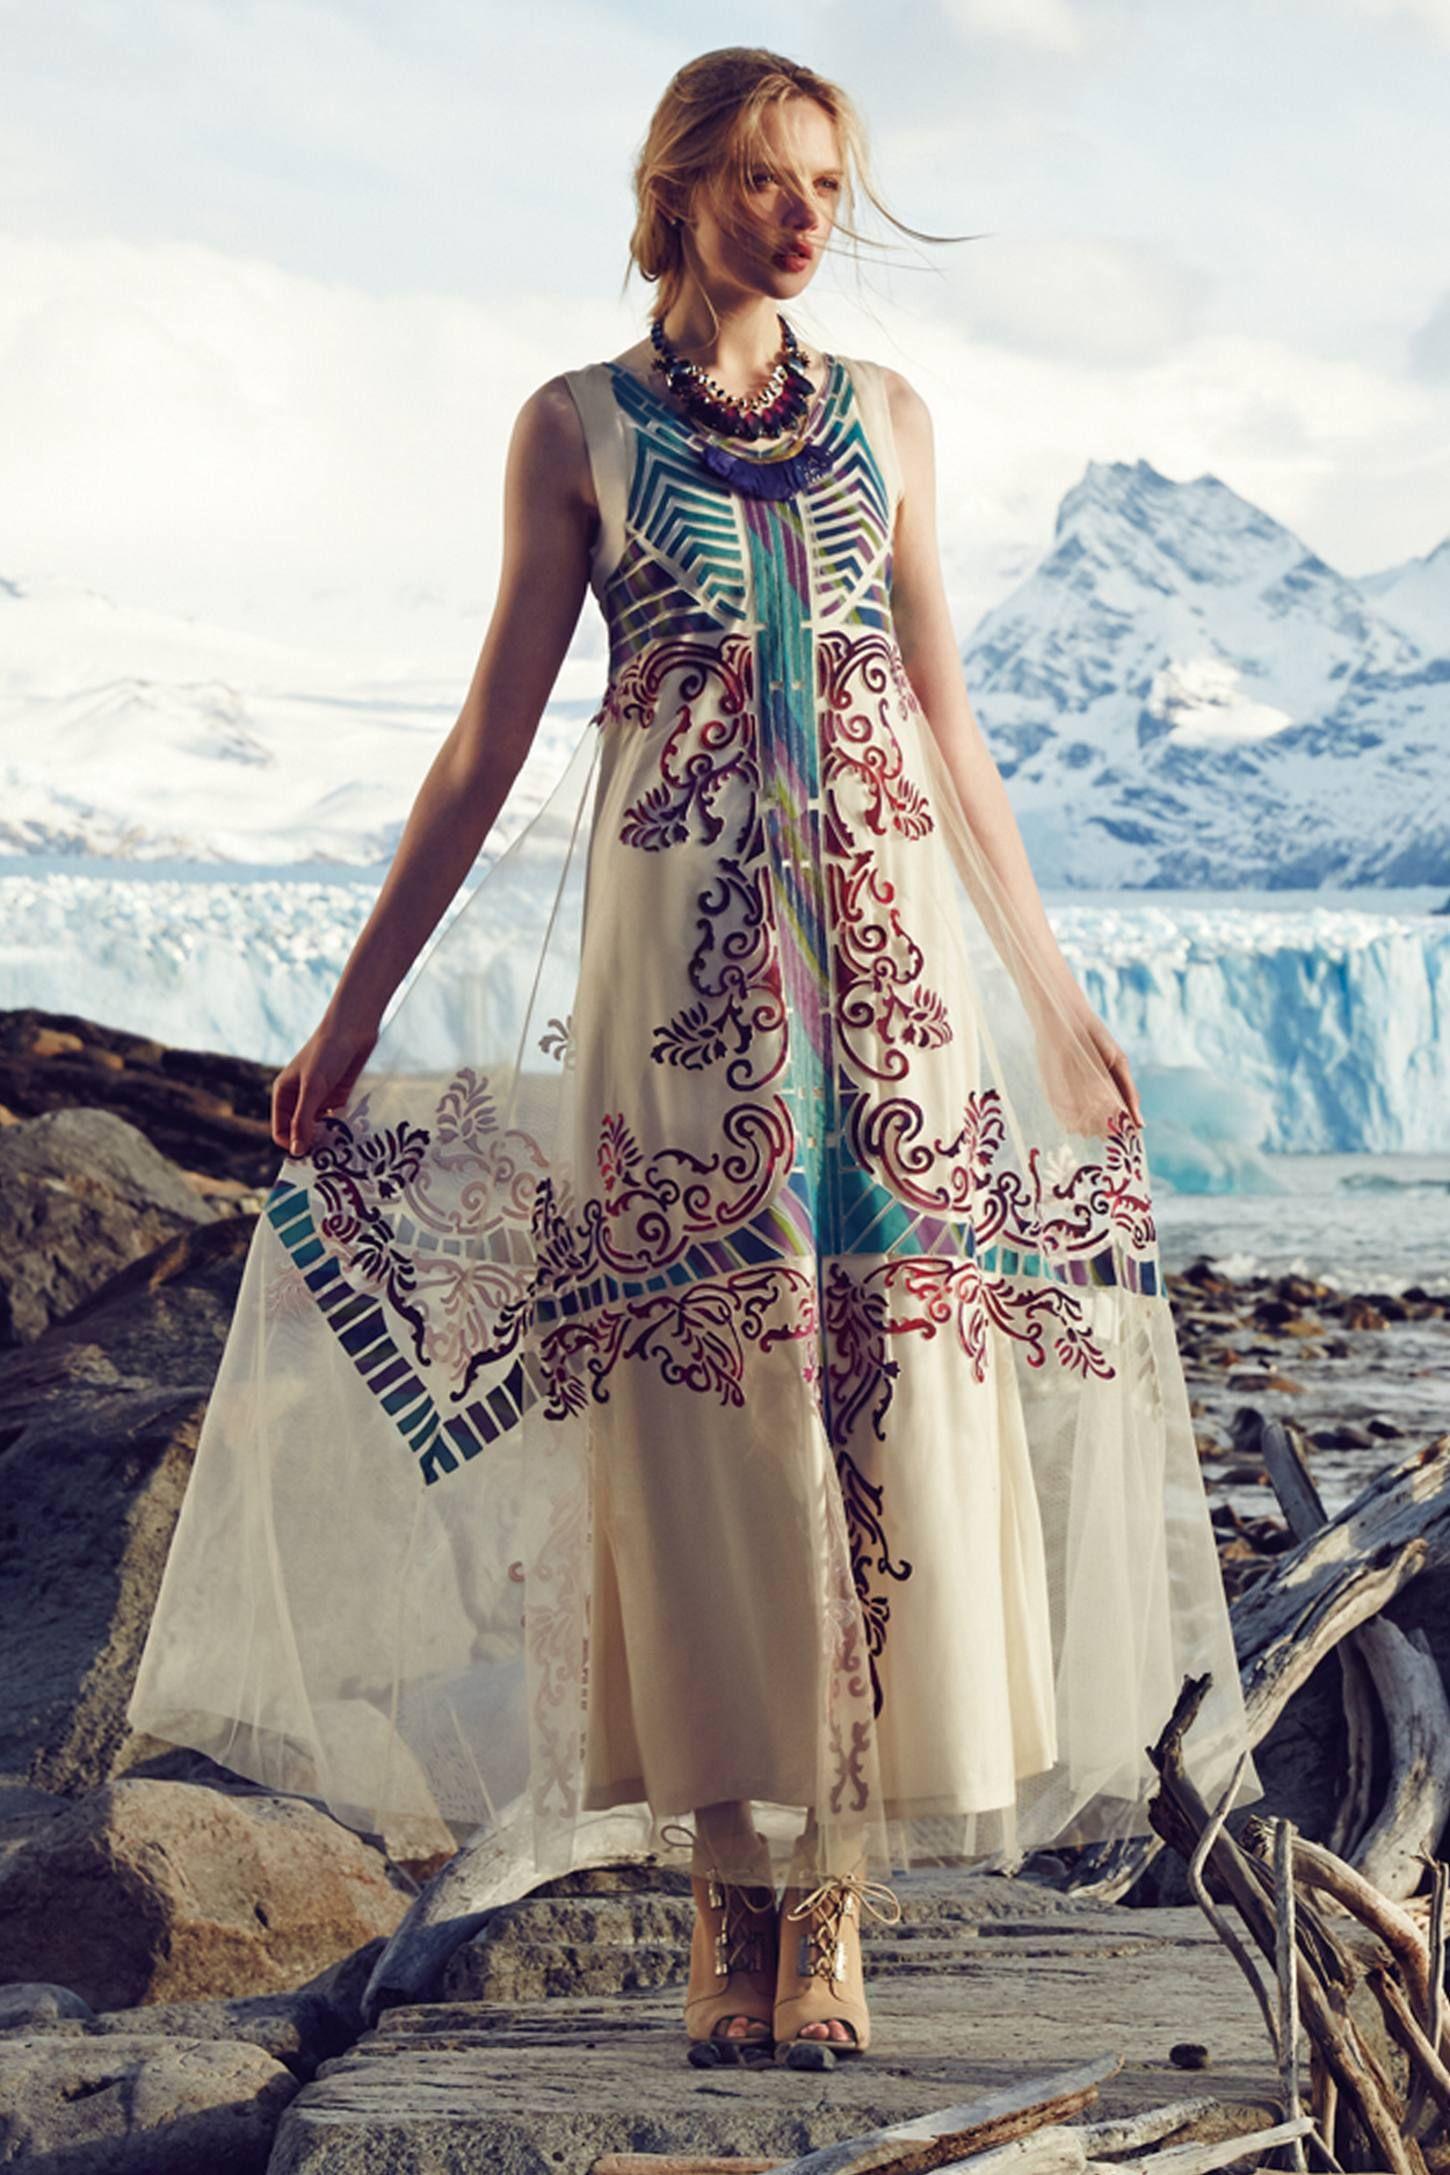 Hermoso como vestido de novia gitana | Noche Mexicana | Pinterest ...